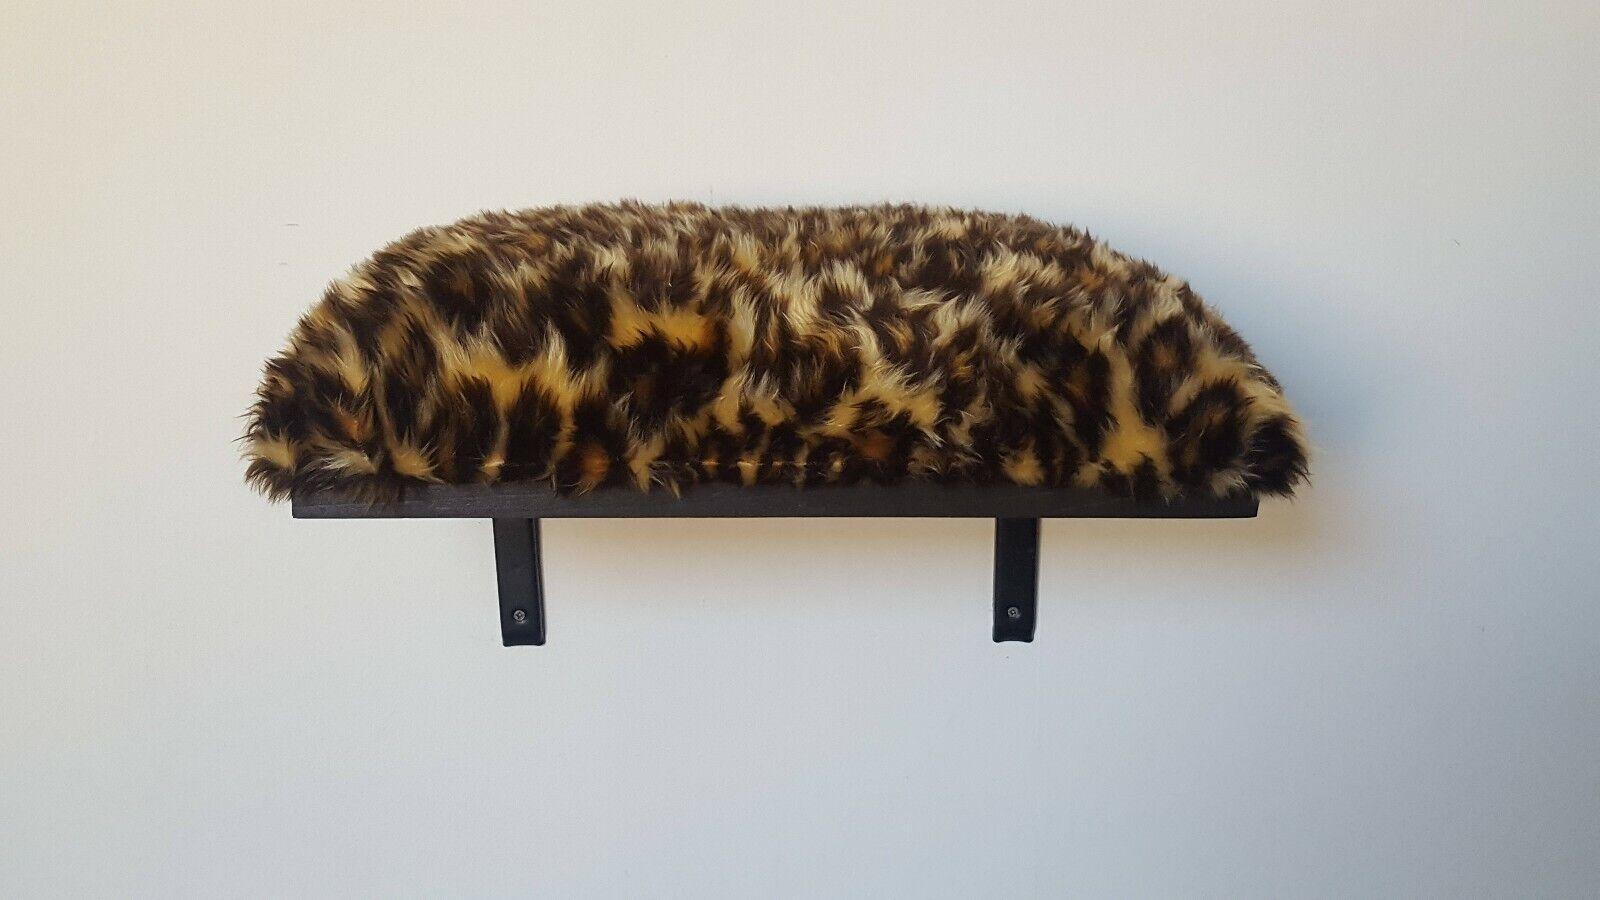 Large Faux Fur Animal Print Cushion Cat Shelf - Pine Wood